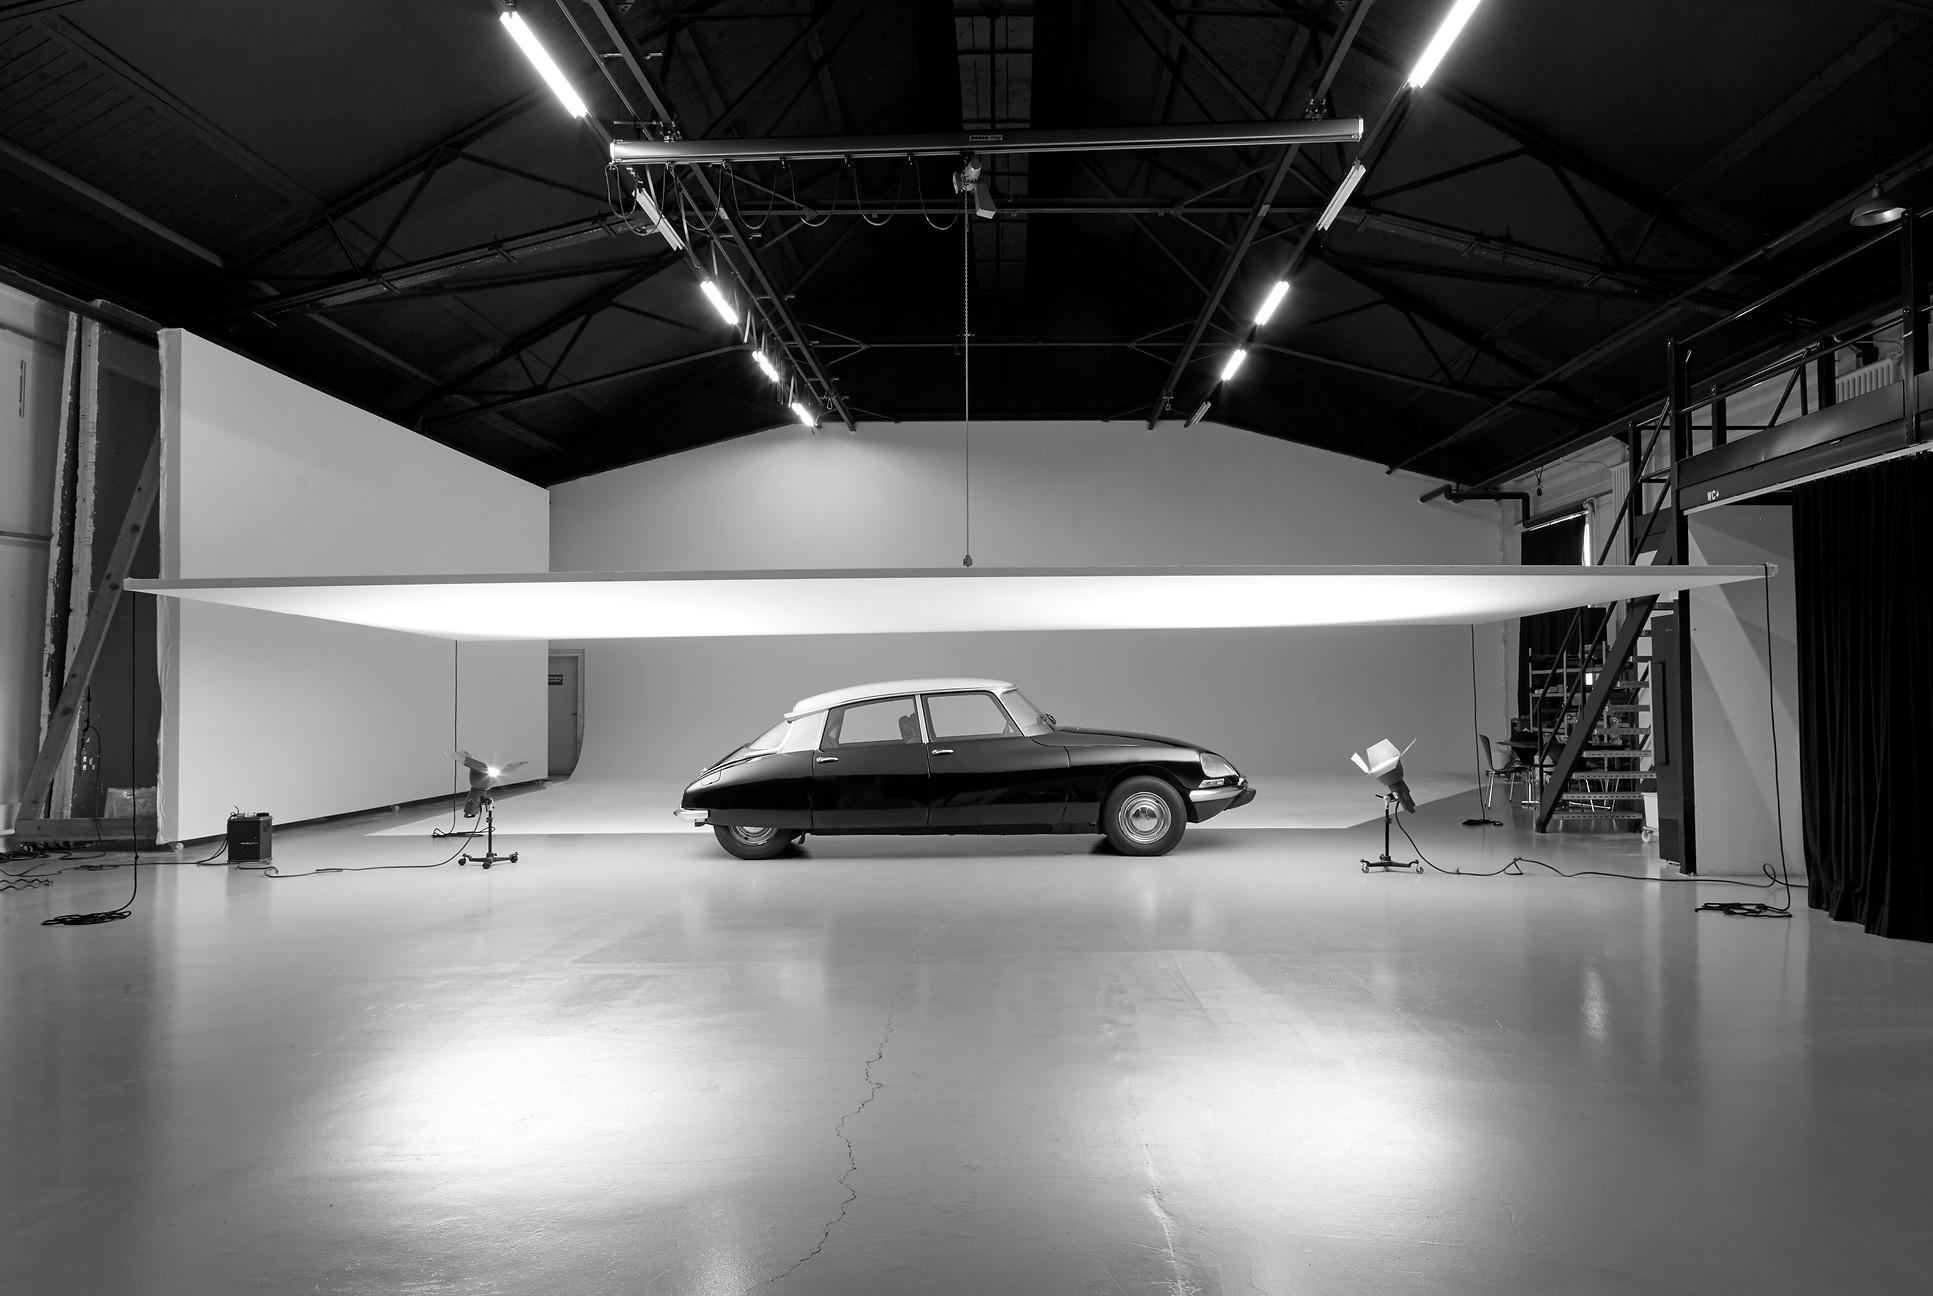 Fotohalle Fotostudio Filmstudio Zürich Schlieren